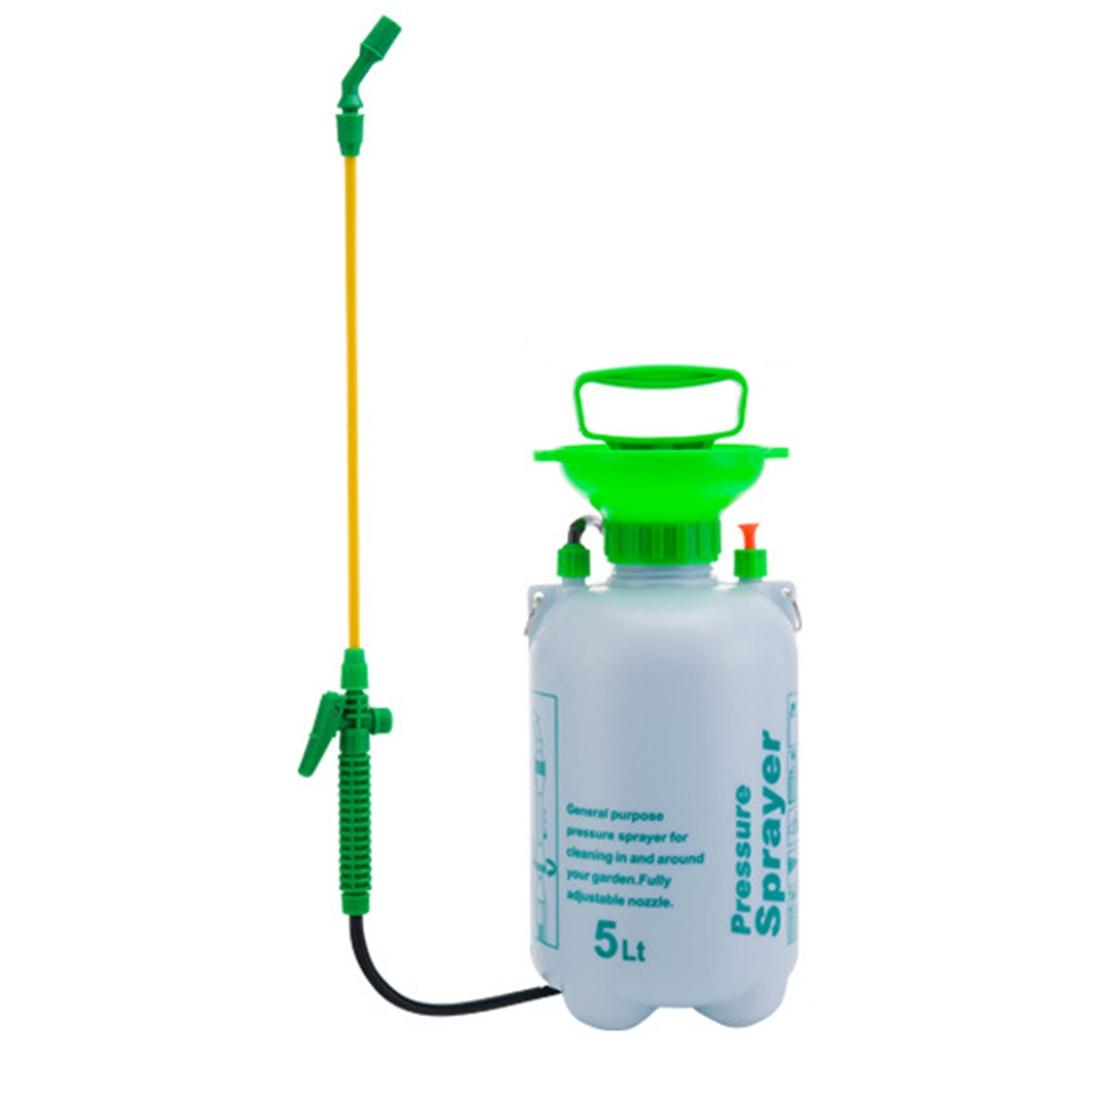 5L Plastic Agricultural Pesticide Spraying Sprayer Shouder Type Sprayer Garden Tool White + Green